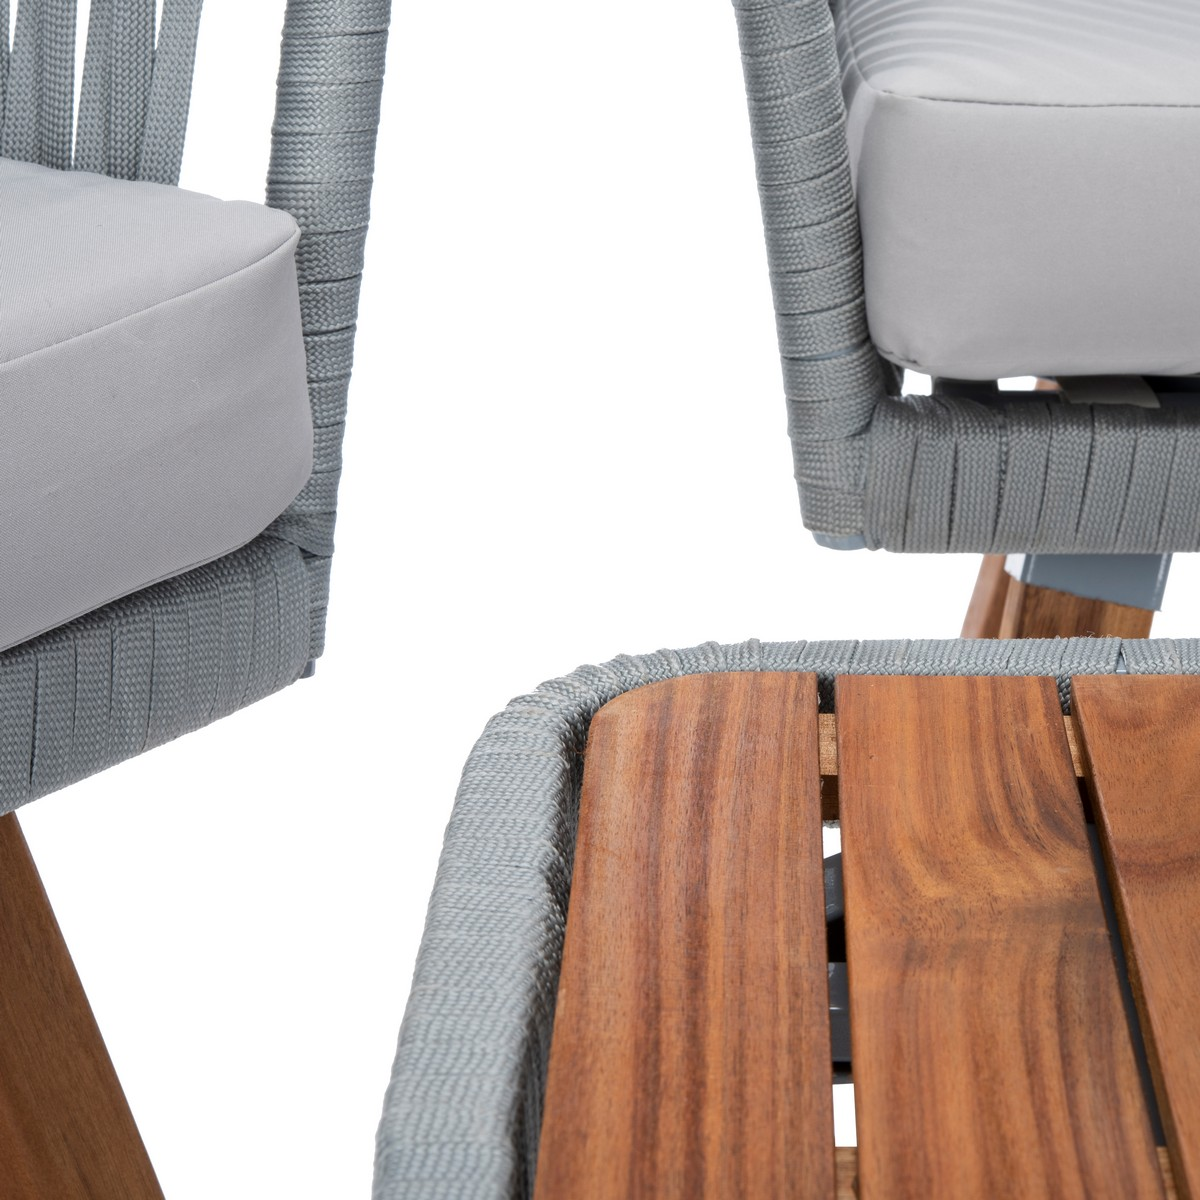 PAT7074C Patio Sets - 4 Piece - Furniture by Safavieh on Safavieh Ransin id=29484